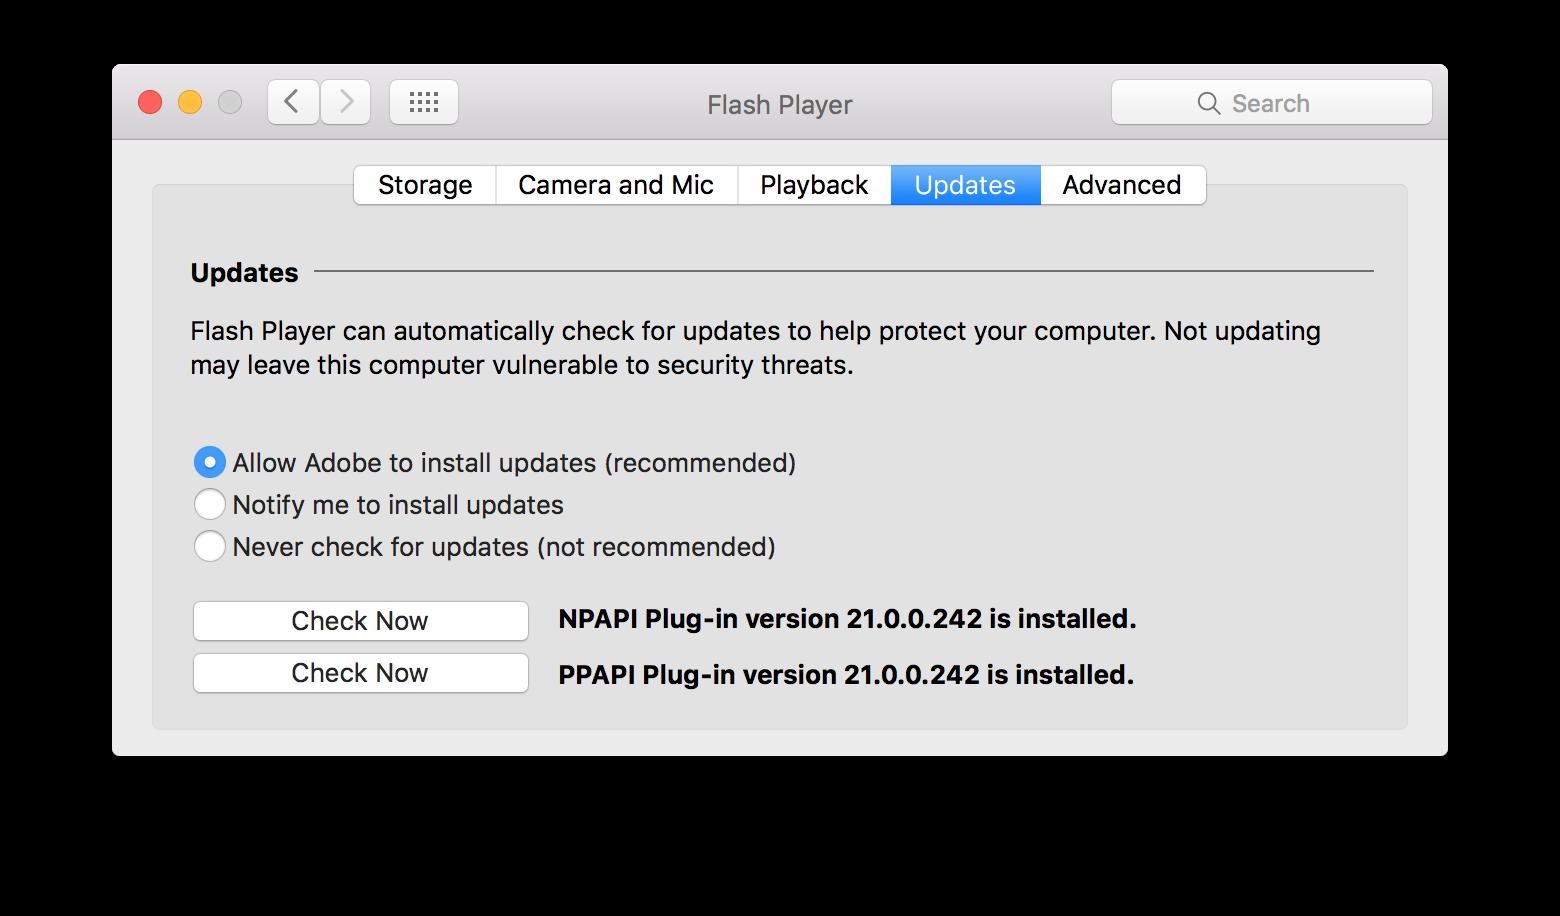 Flash Player System Preference pane